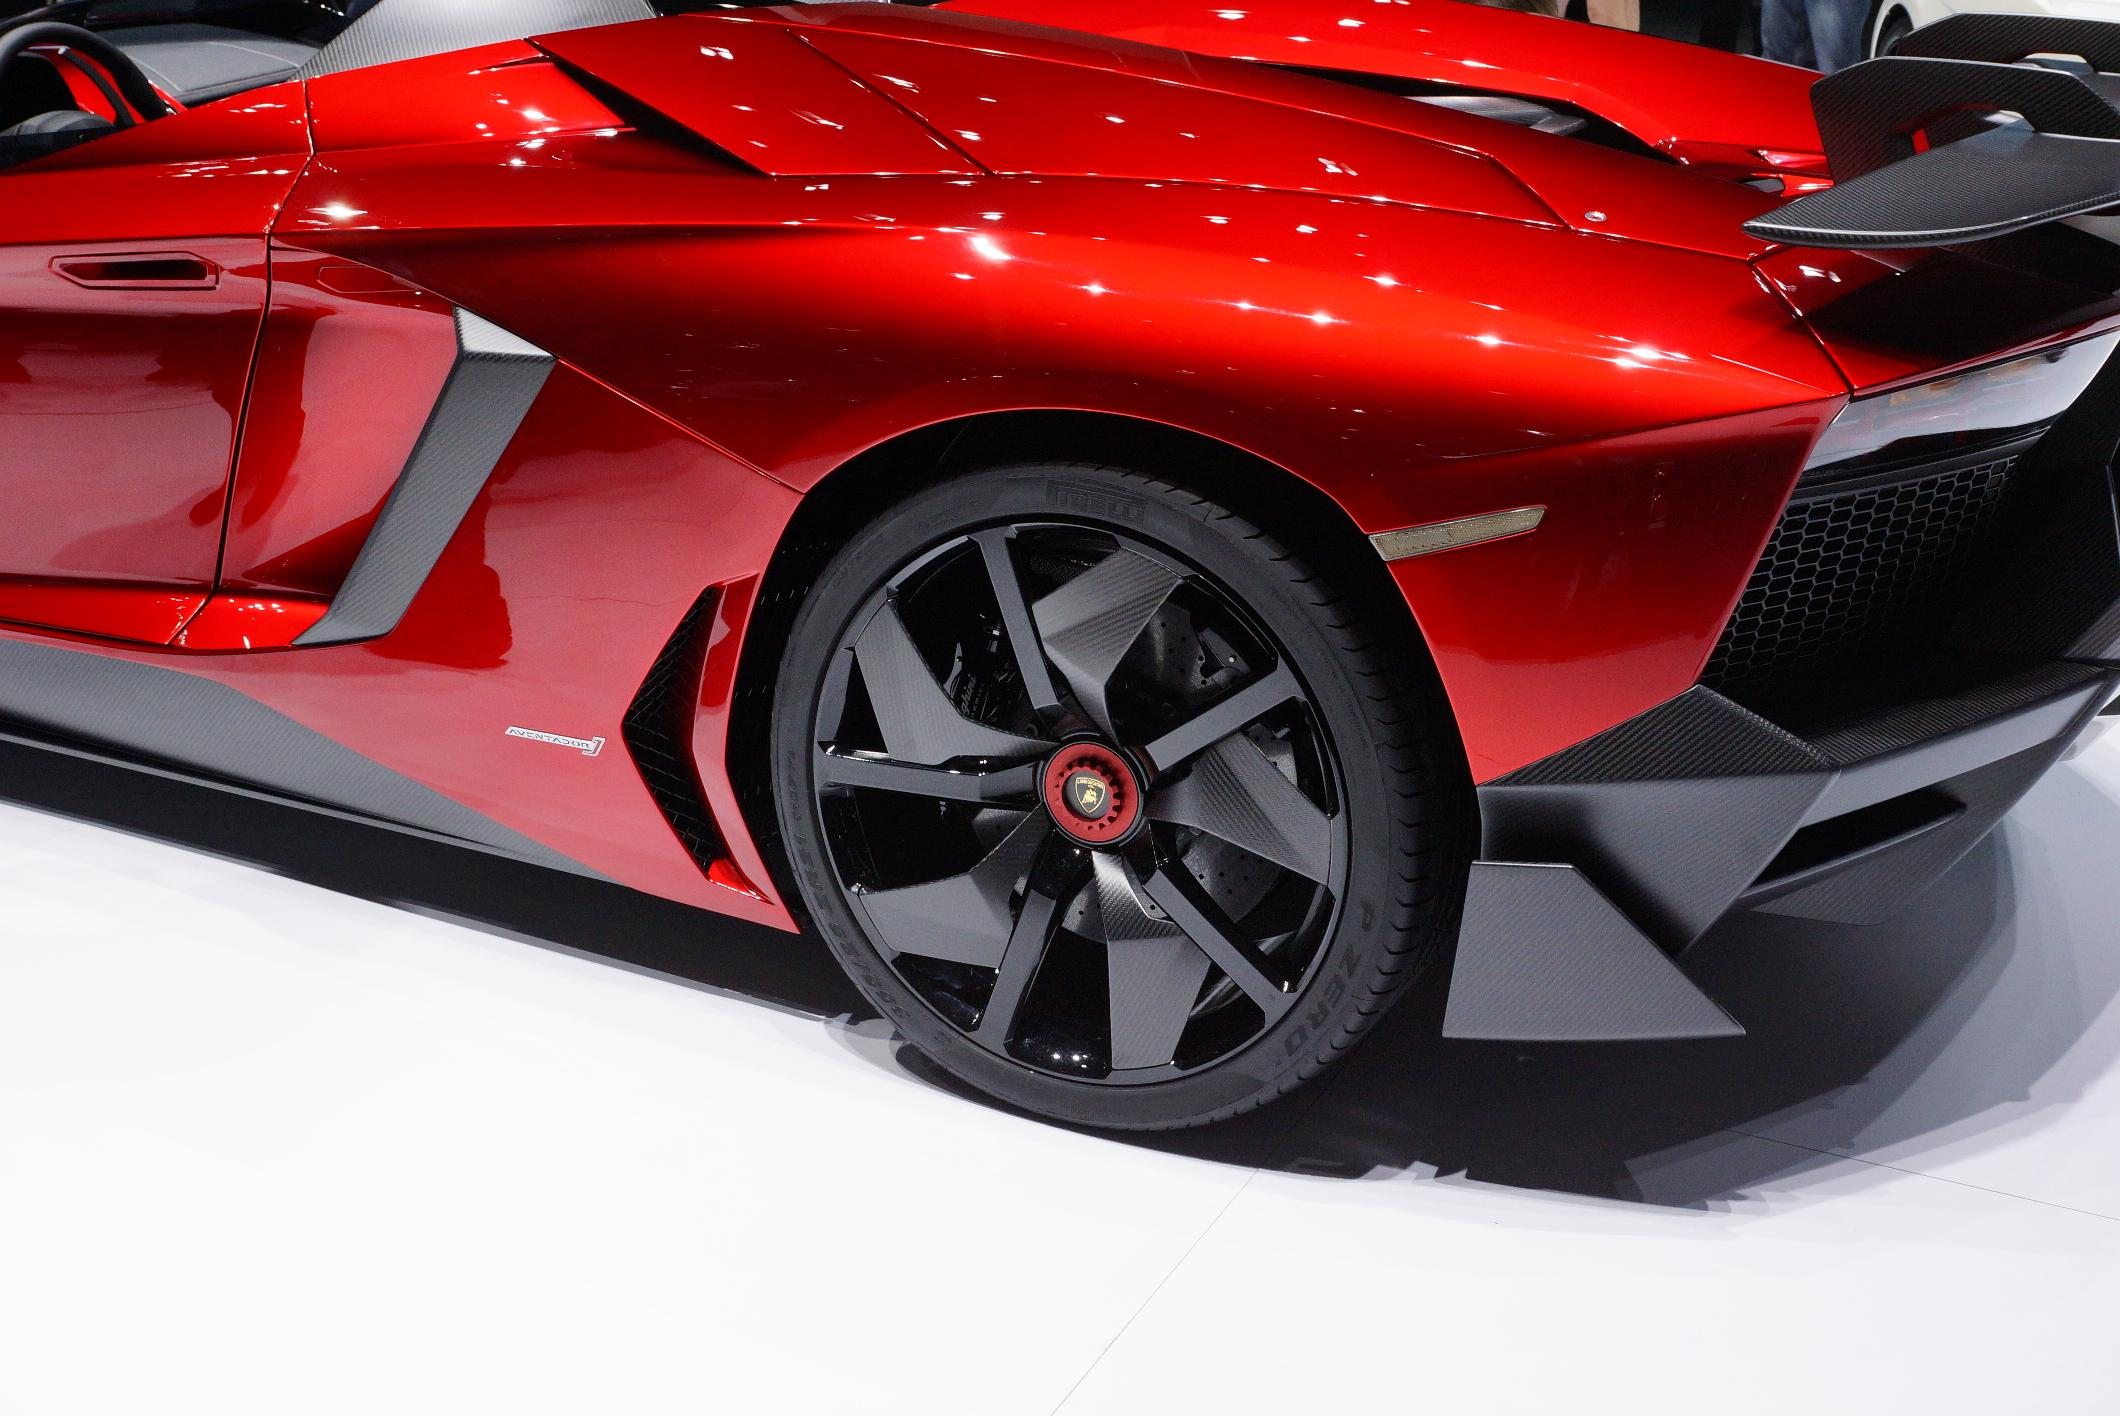 Lamborghini Aventador J Geneva 2012 Wheel